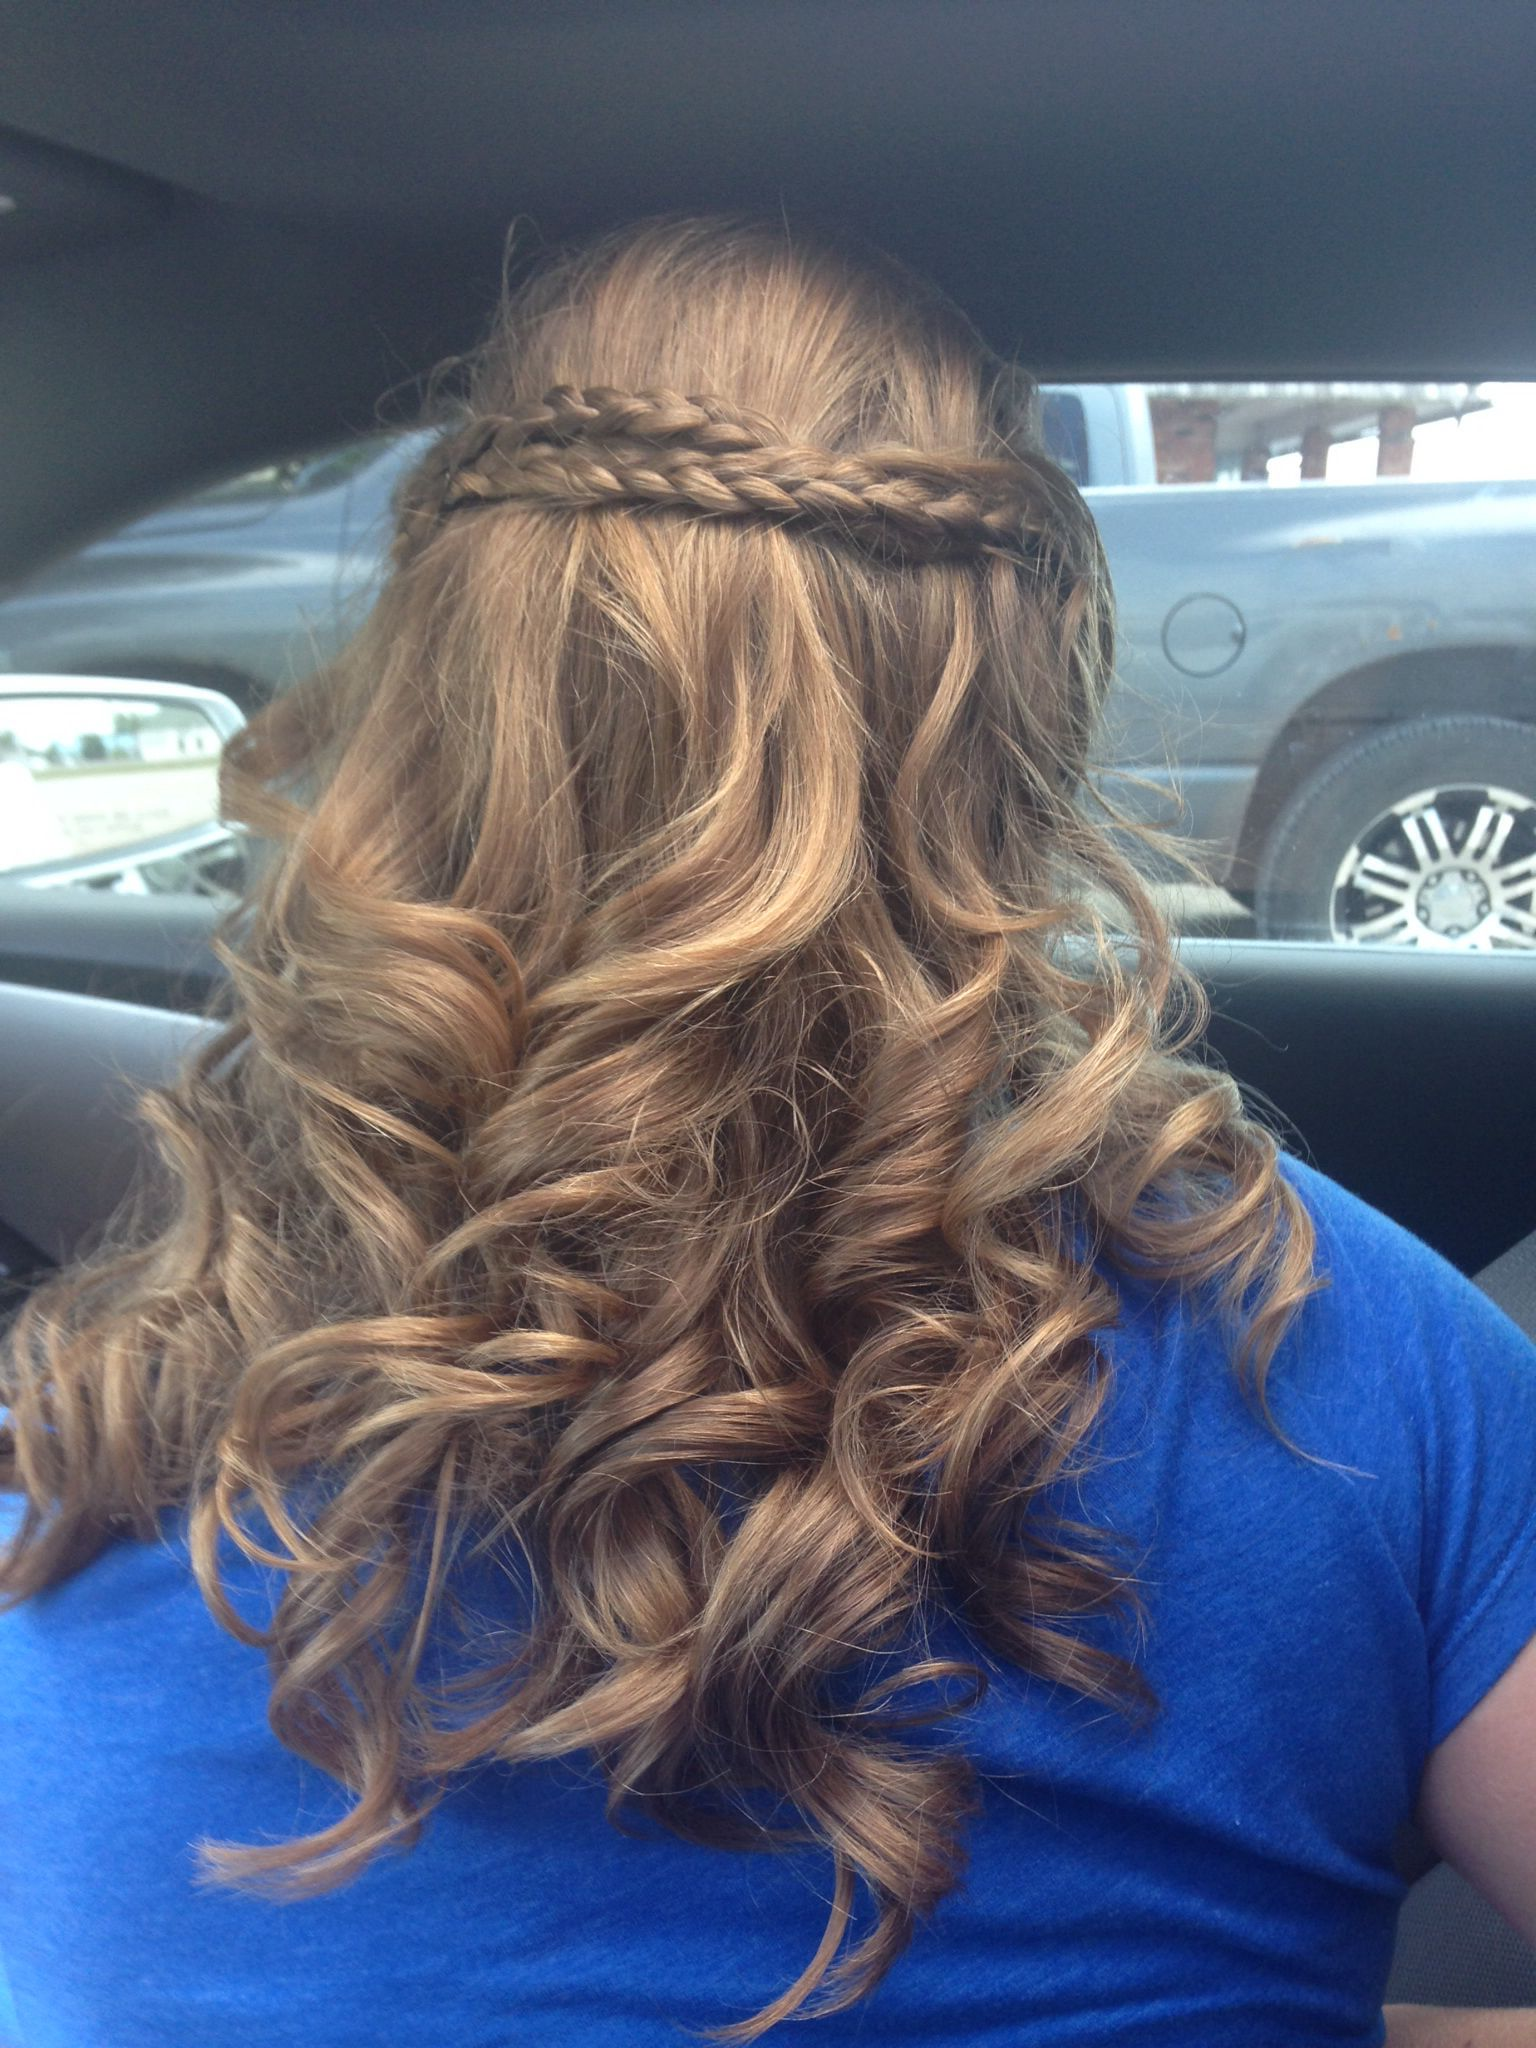 My Hair For 6th Grade Graduation Hair Cool Hairstyles Hair Styles